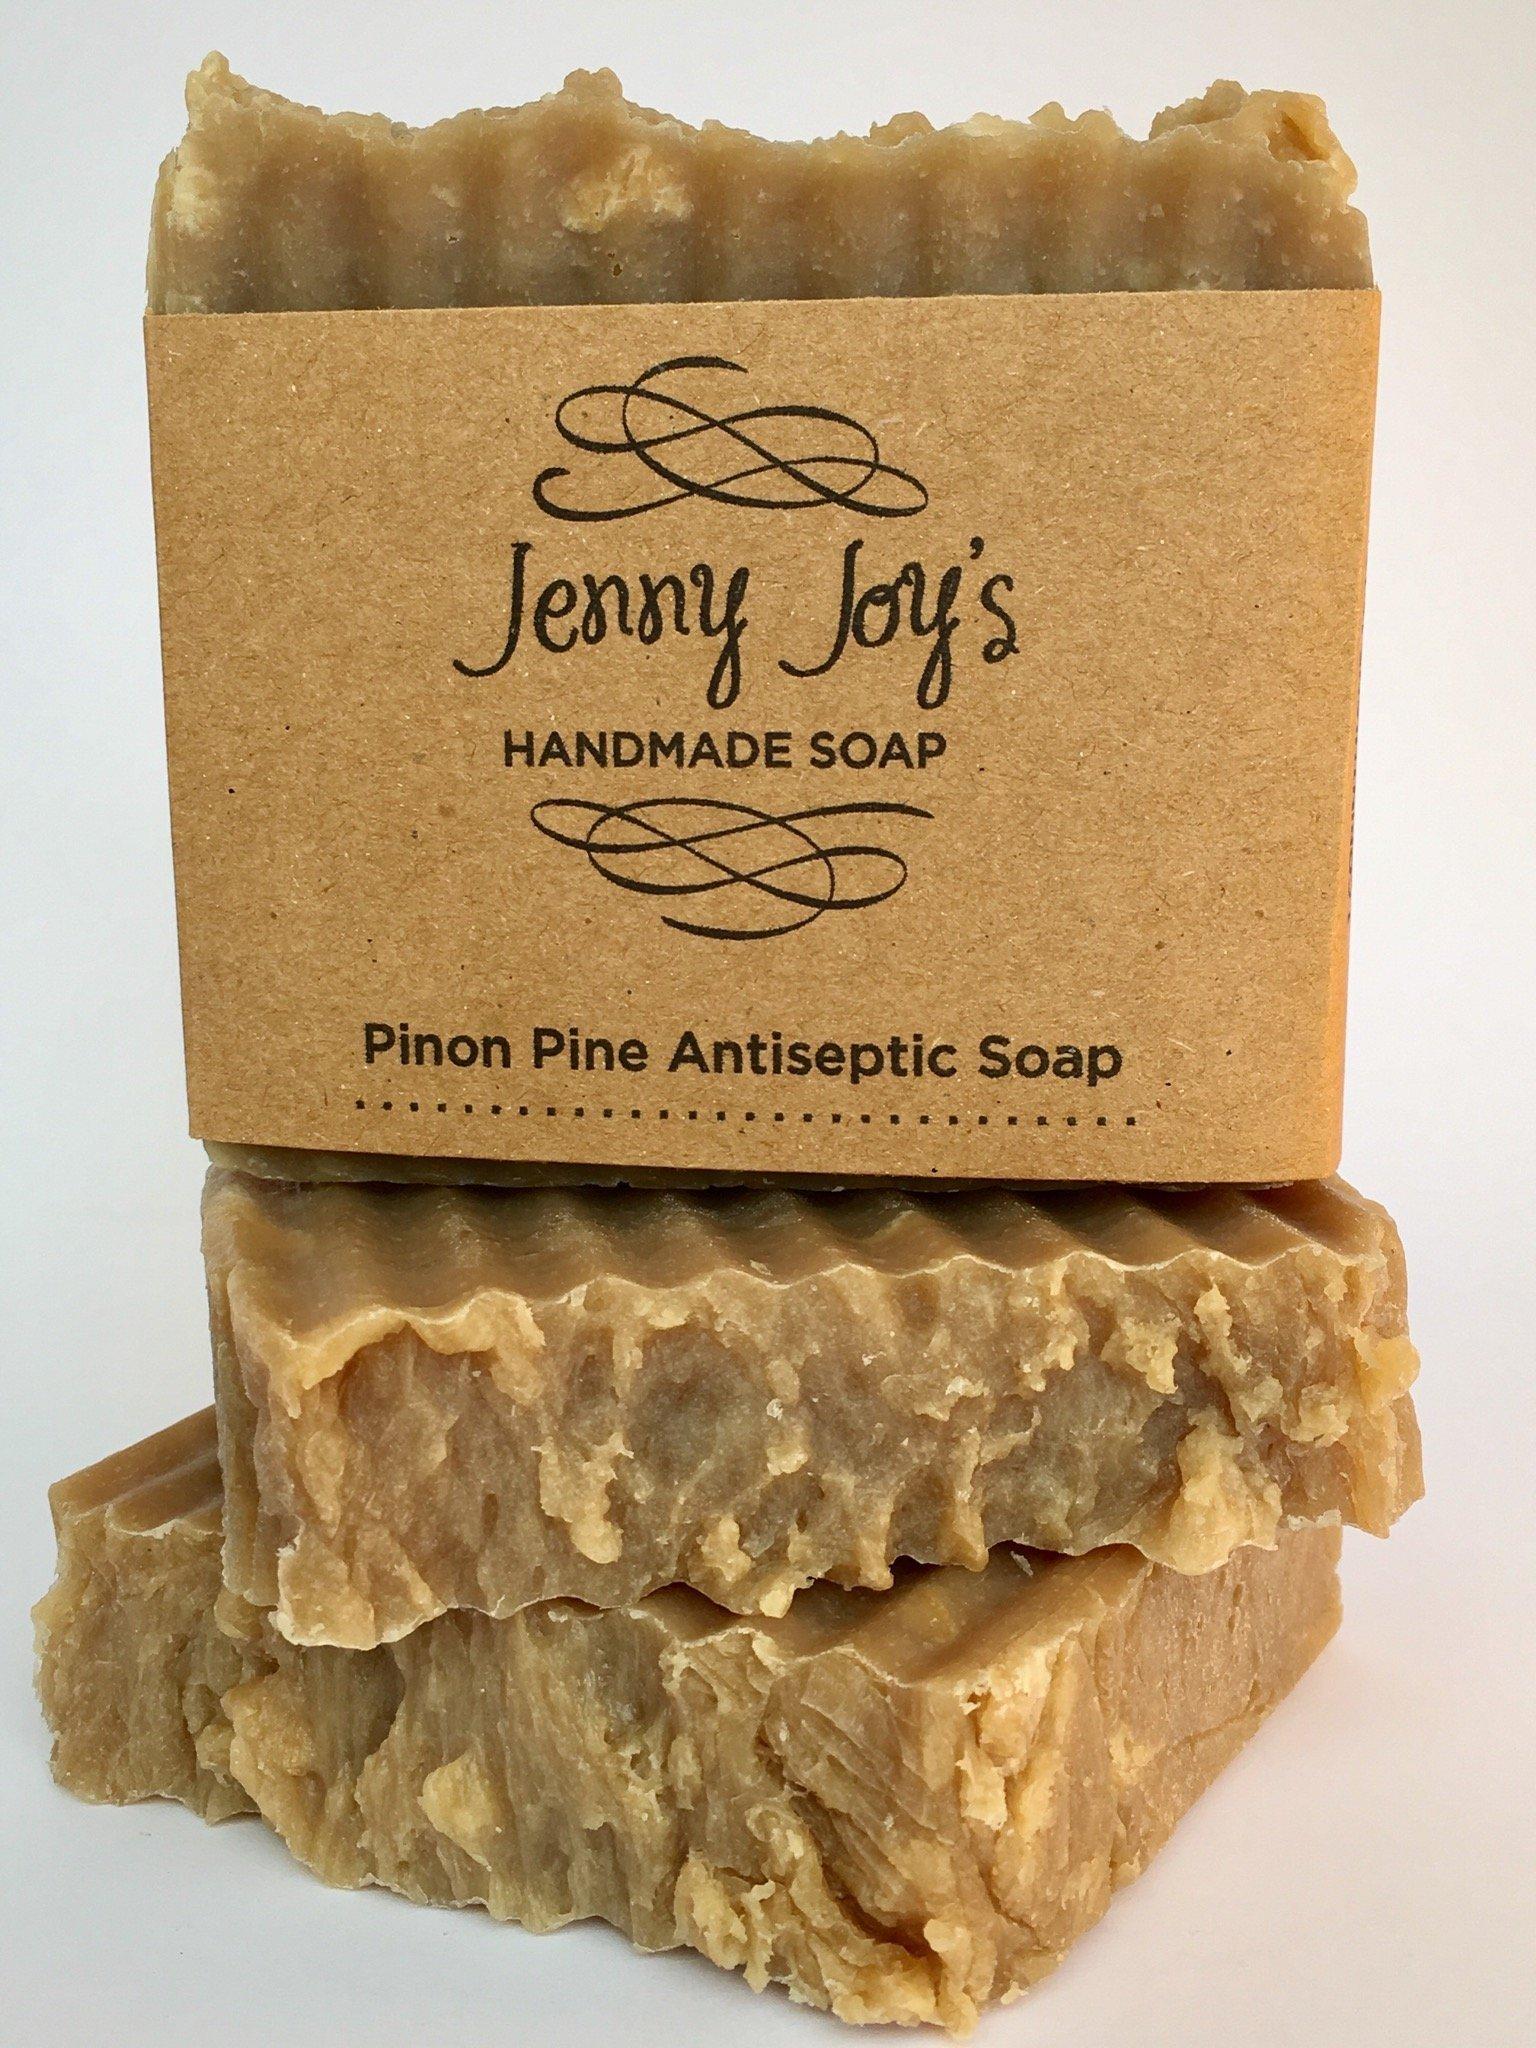 Jenny Joy's Soap Pine Tar Soap of Pinon Wild Harvested for Men & Women Woodsy Scent Skin Scrub, Moisturizes & Soothes Dry Skin, Psoriasis, Bug Bites & Eczema Handmade 5-6 oz. Bar Southwest Healing